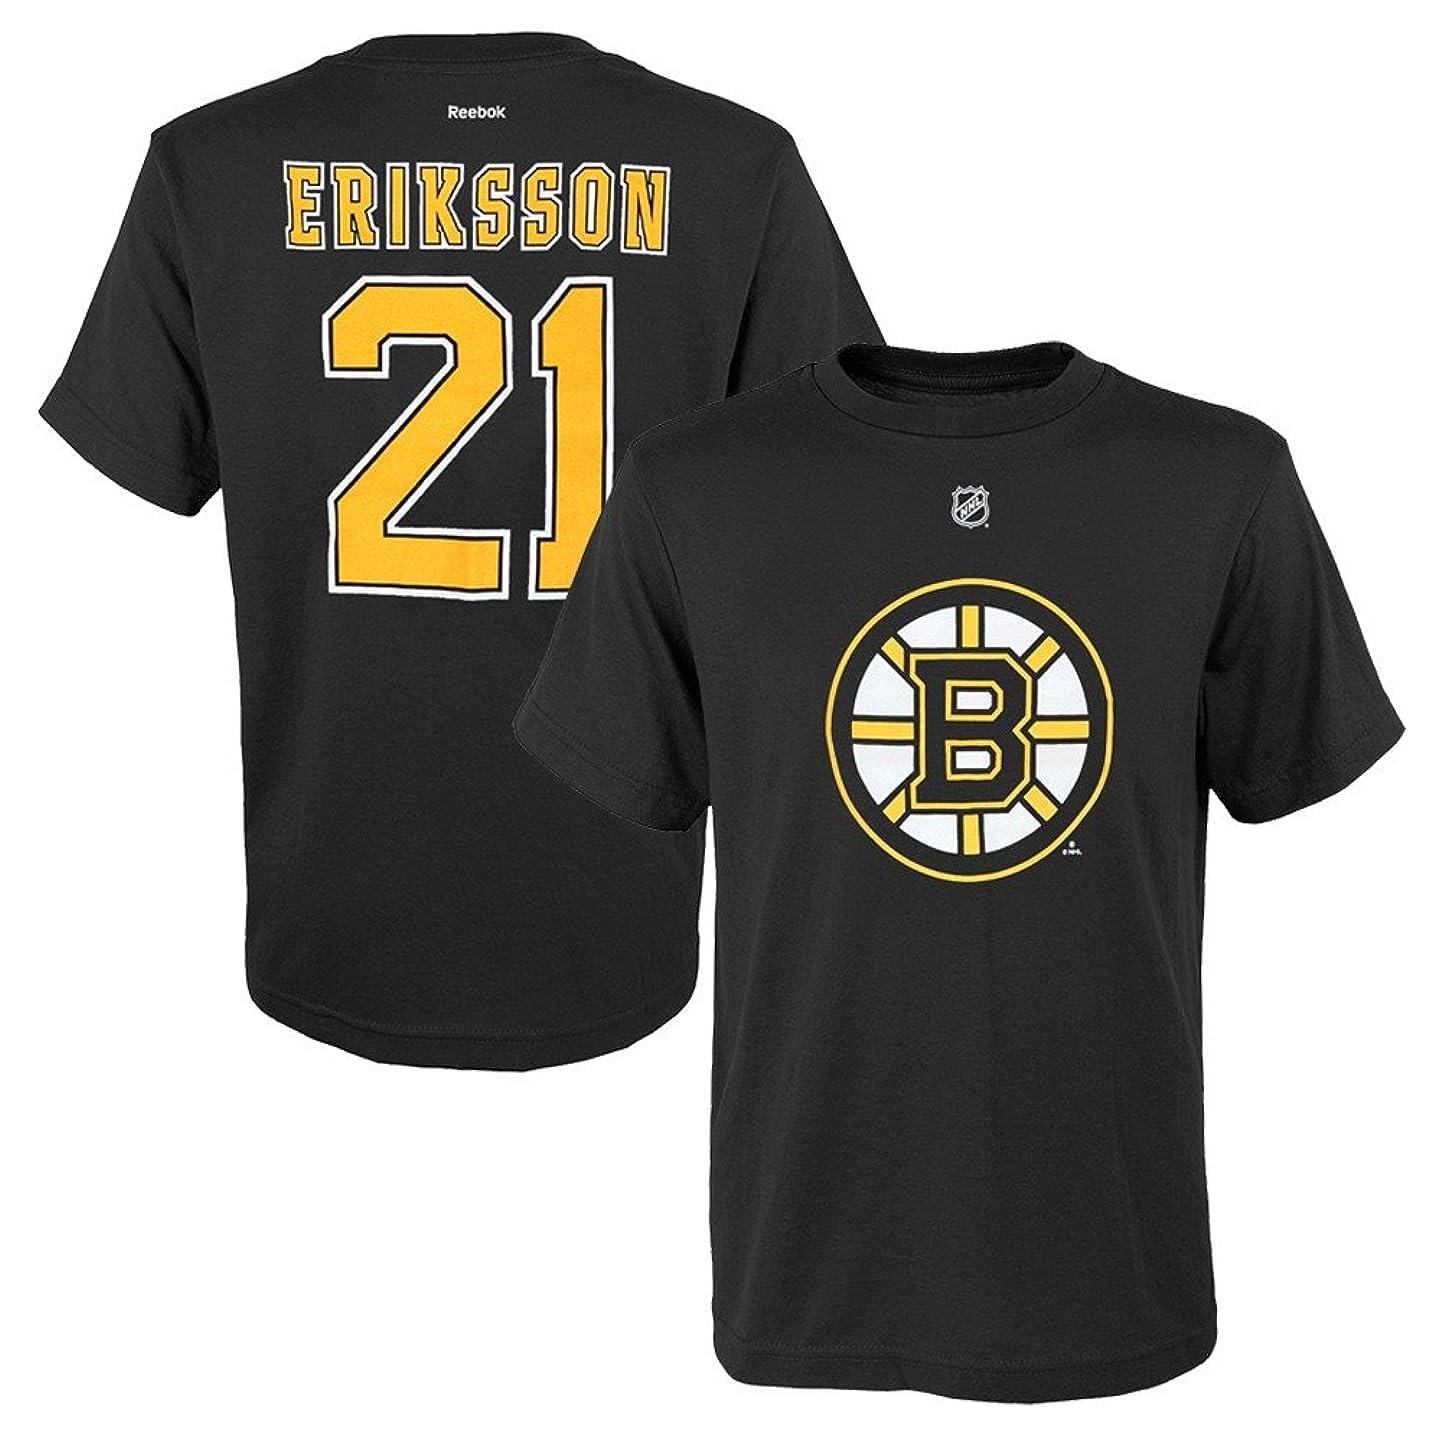 Outerstuff Loui Eriksson NHL Reebok Boston Bruins Player Jersey Black T-Shirt Youth (S-XL) rjlfyvbsnse0